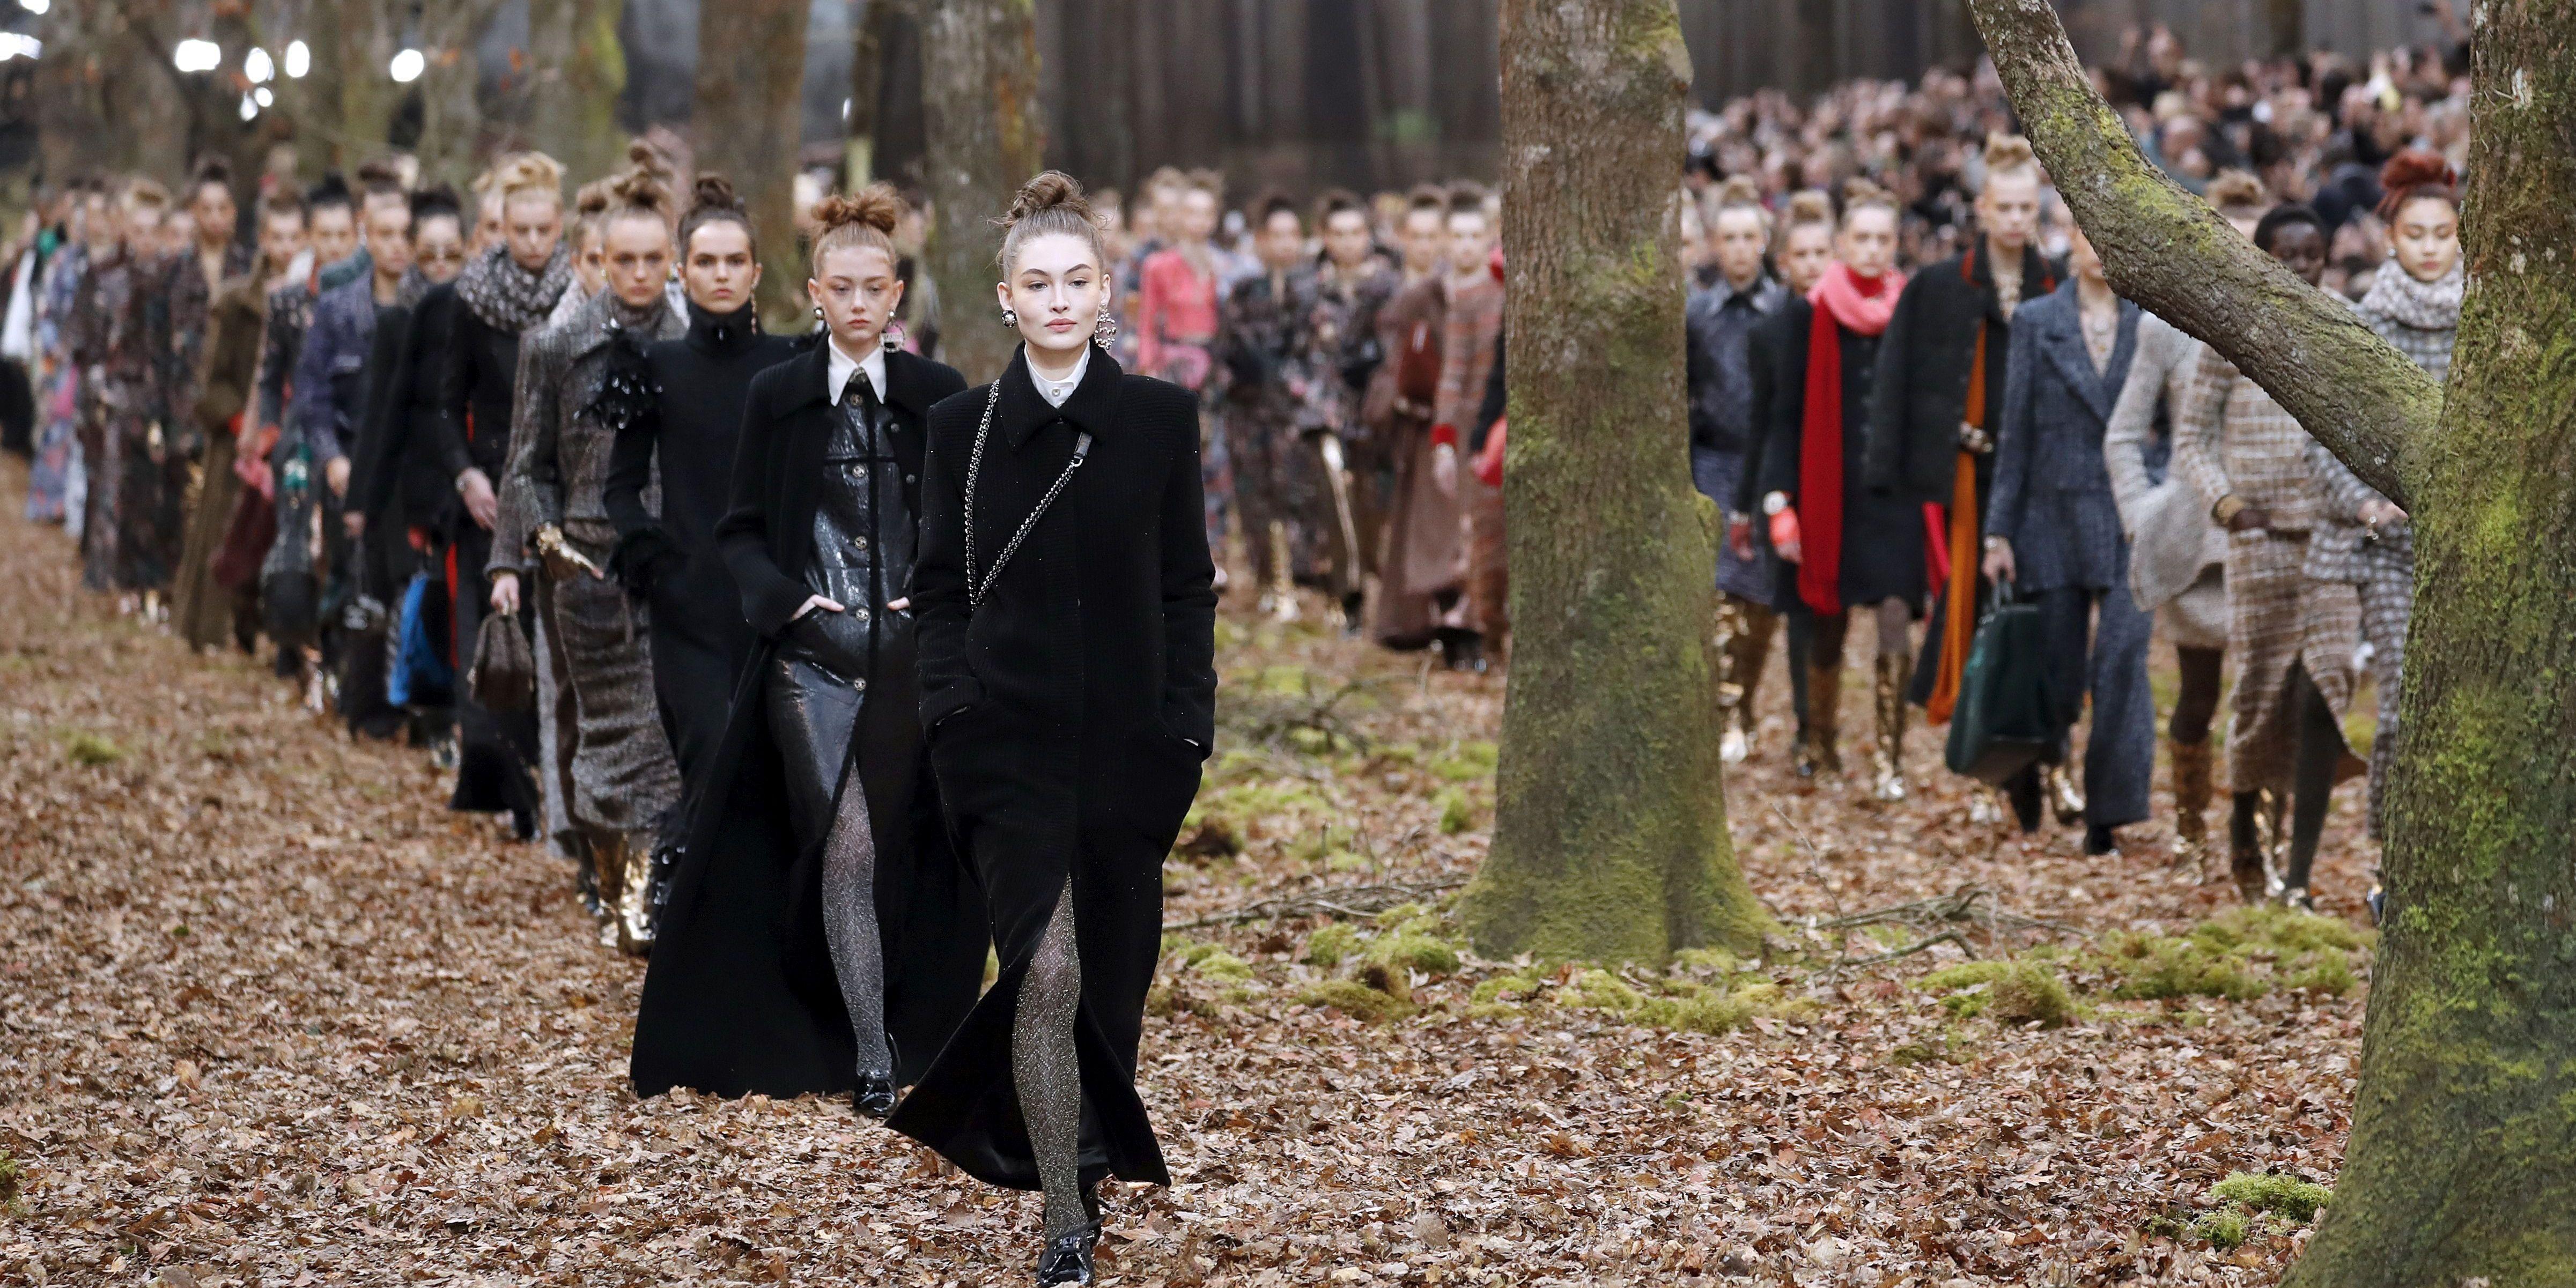 Chanel fashion show 2018 video 52